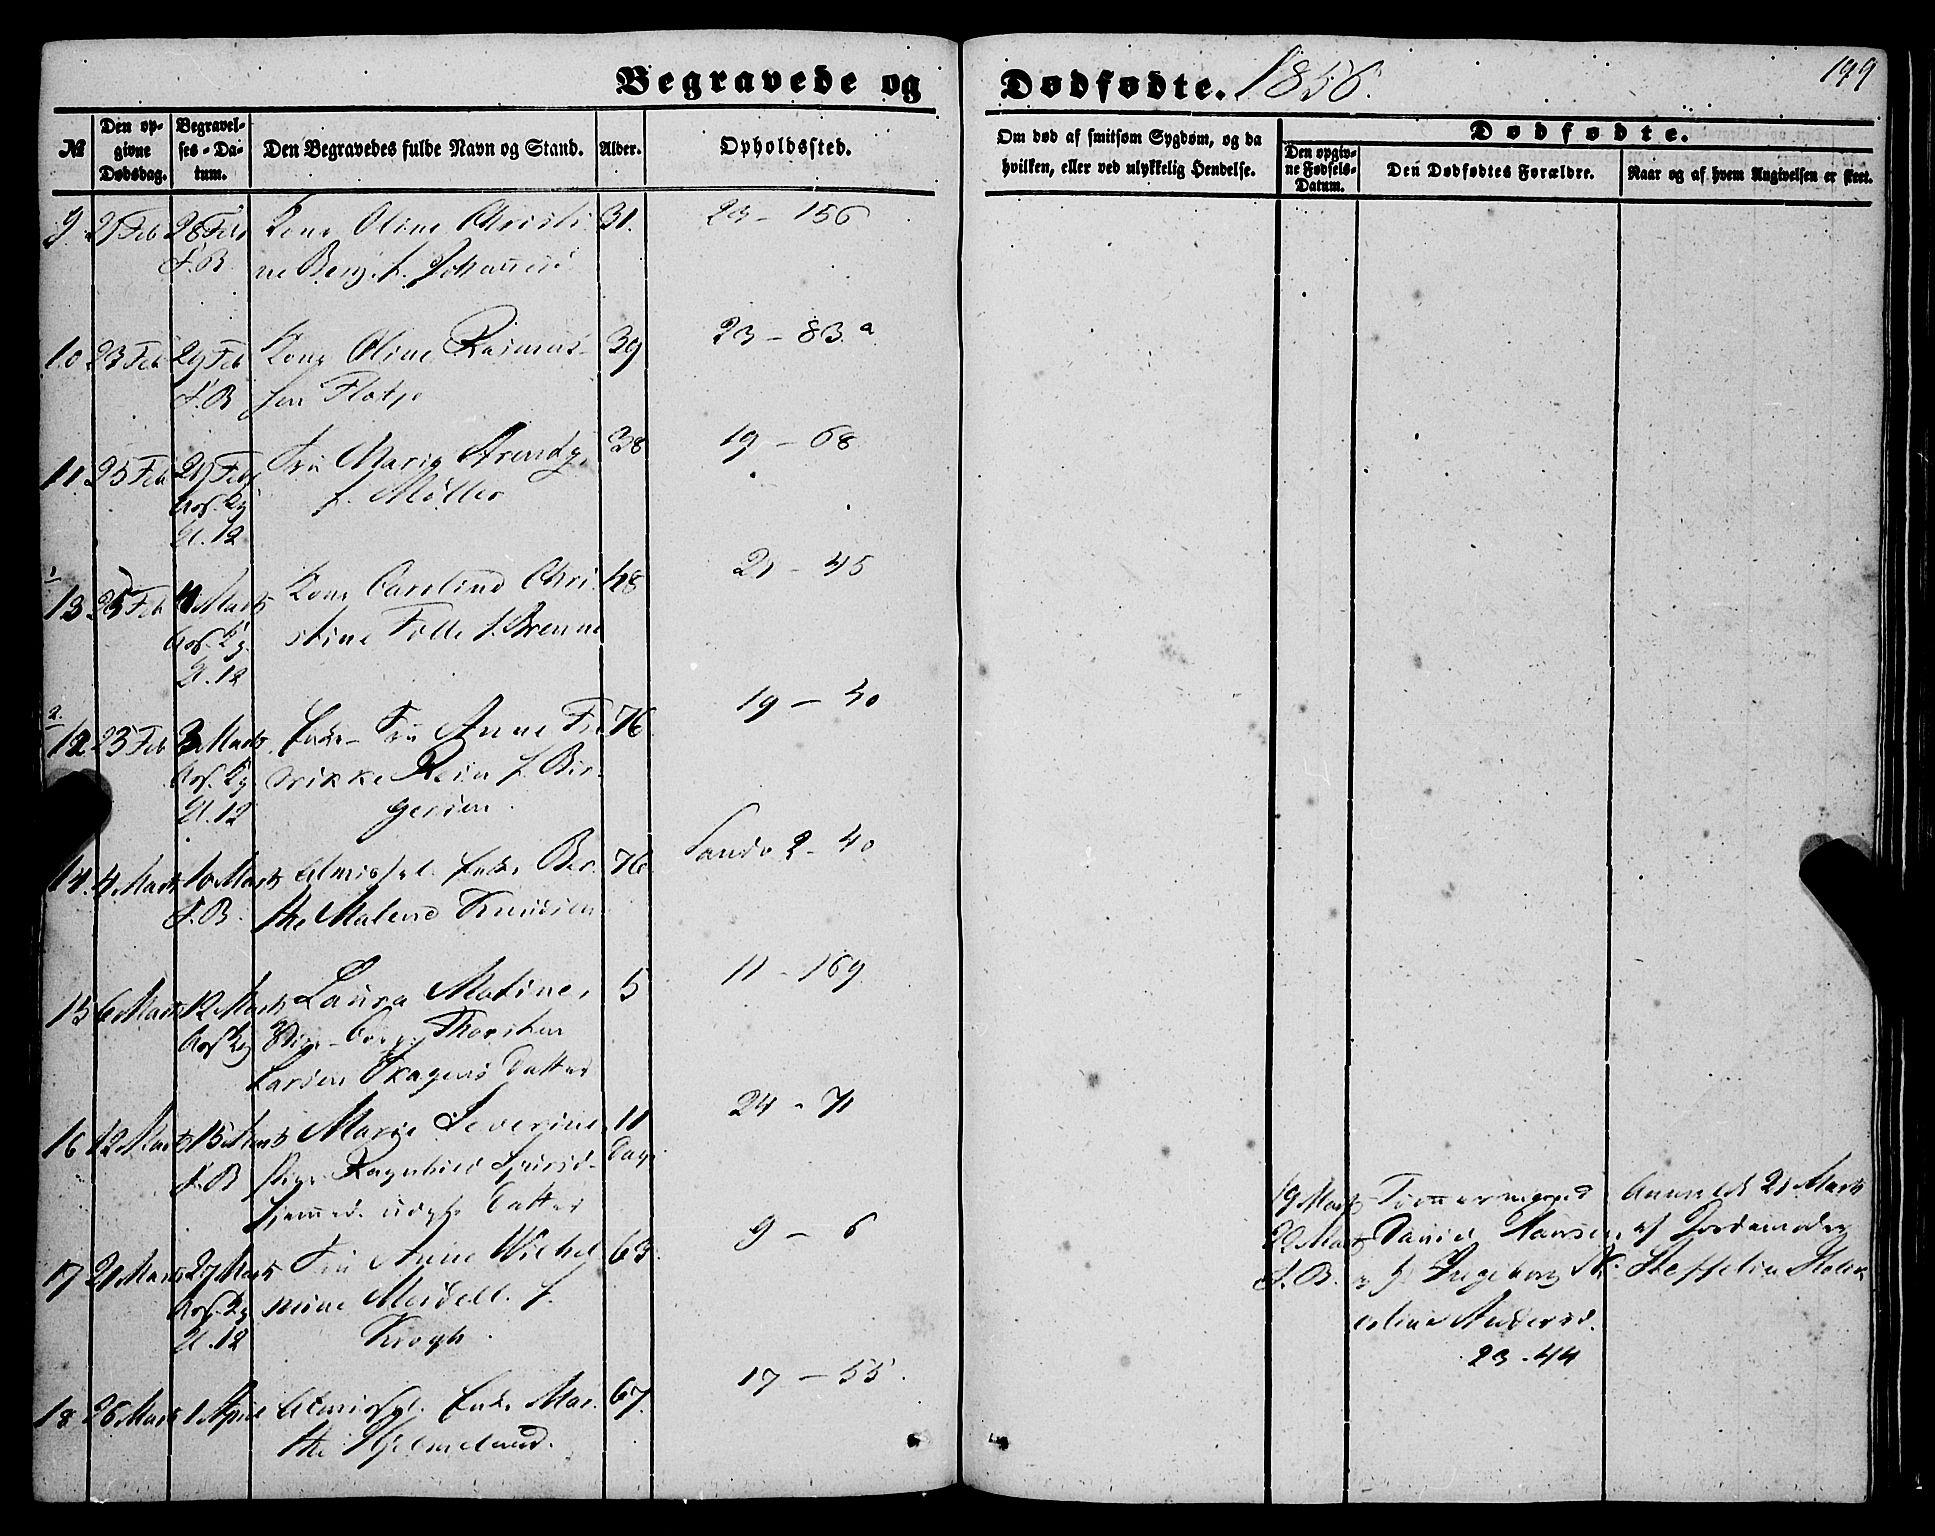 SAB, Korskirken Sokneprestembete, H/Haa: Ministerialbok nr. E 2, 1848-1862, s. 199